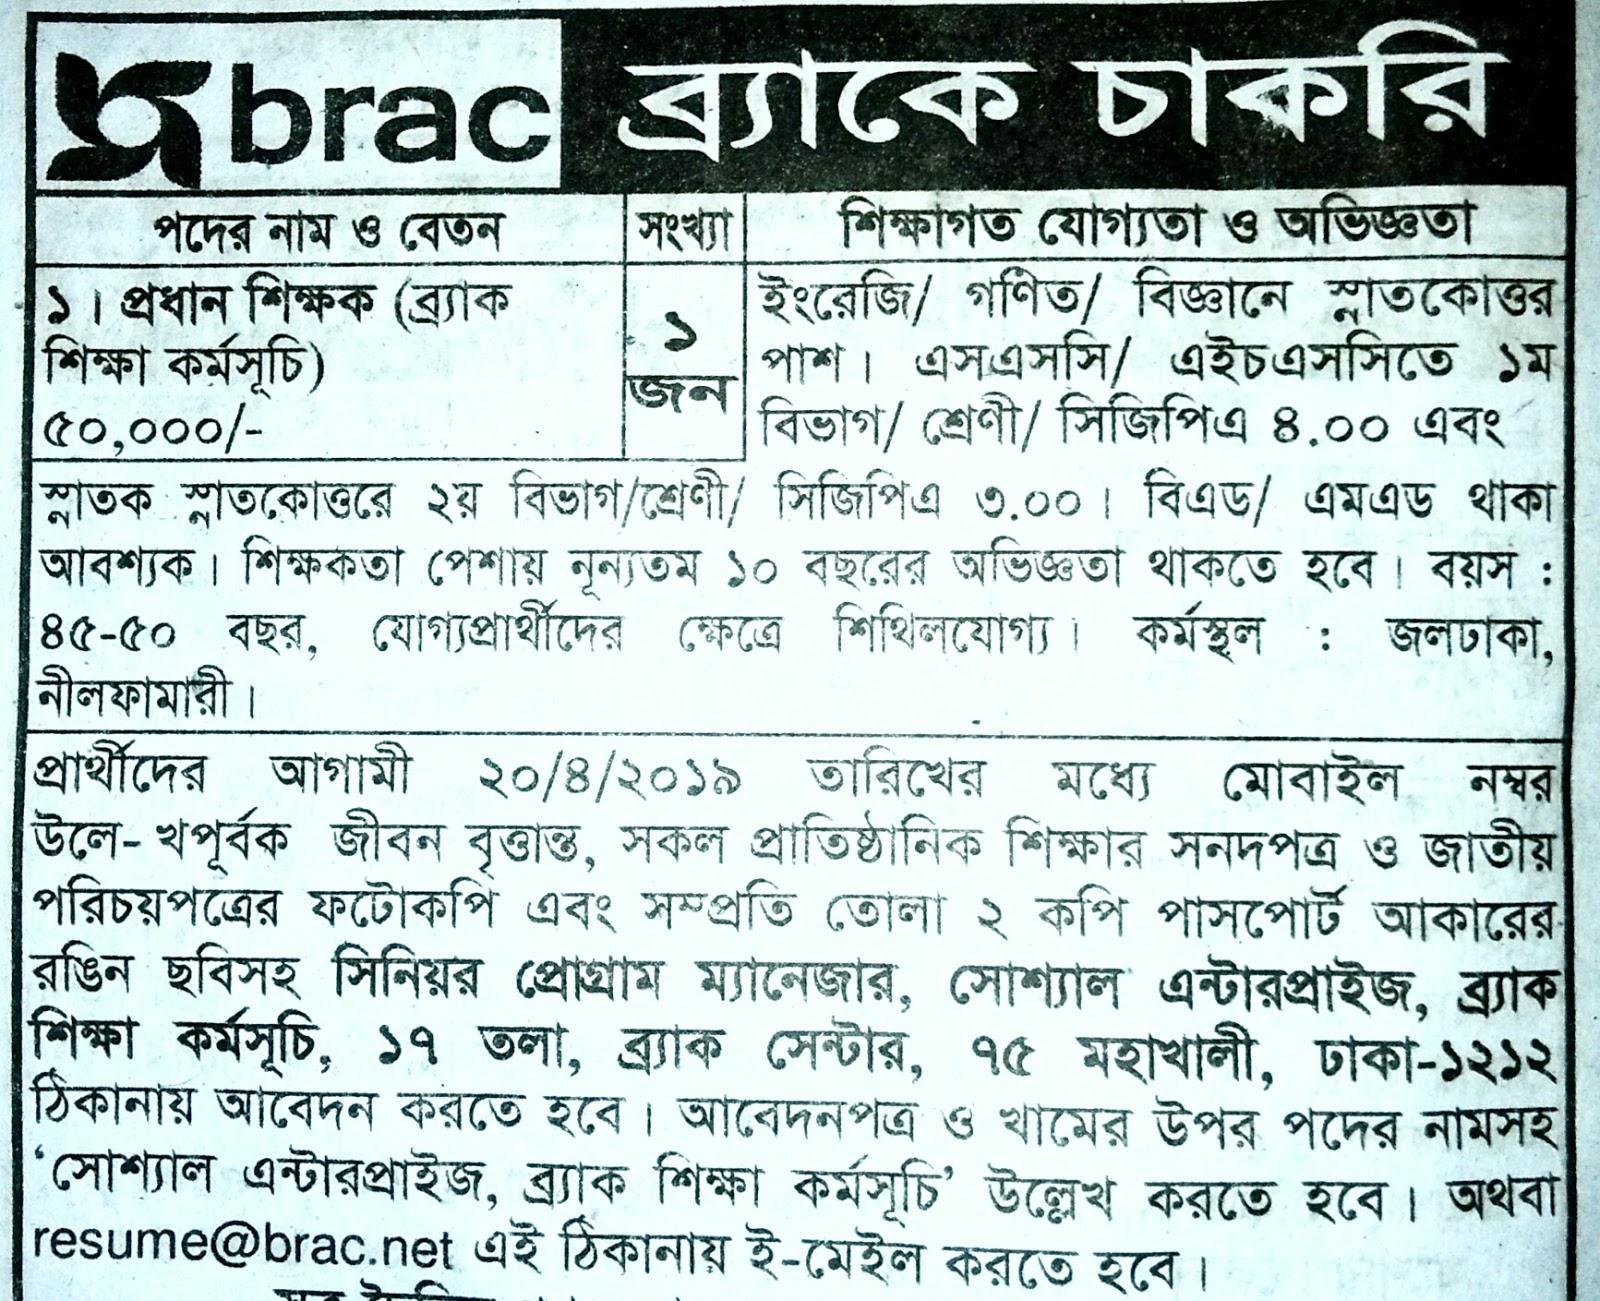 Brac job circular 2019. ব্র্যাক নিয়োগ বিজ্ঞপ্তি ২০১৯